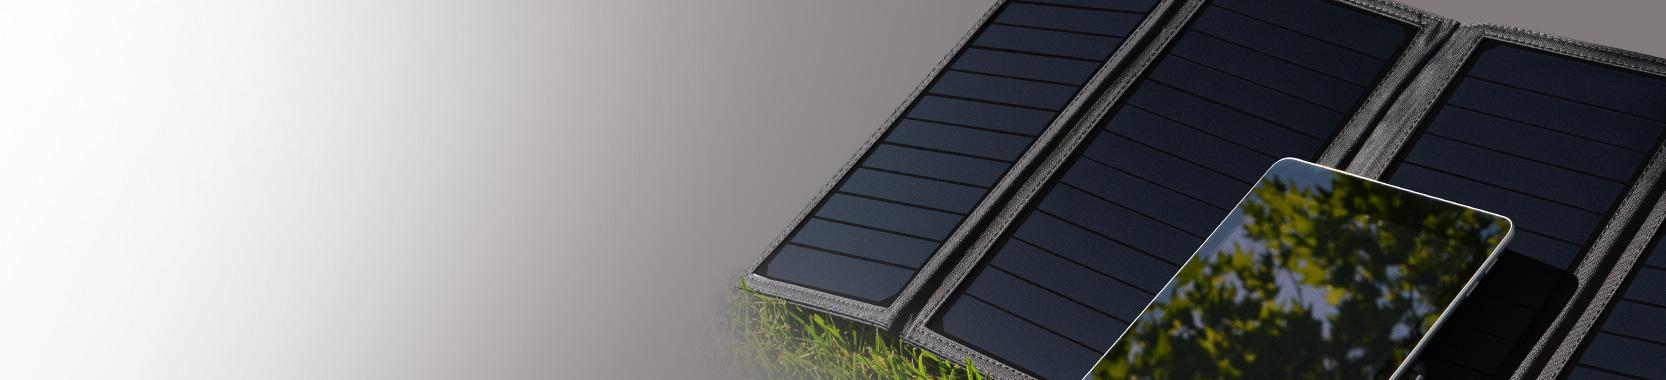 portable-panels-.jpg